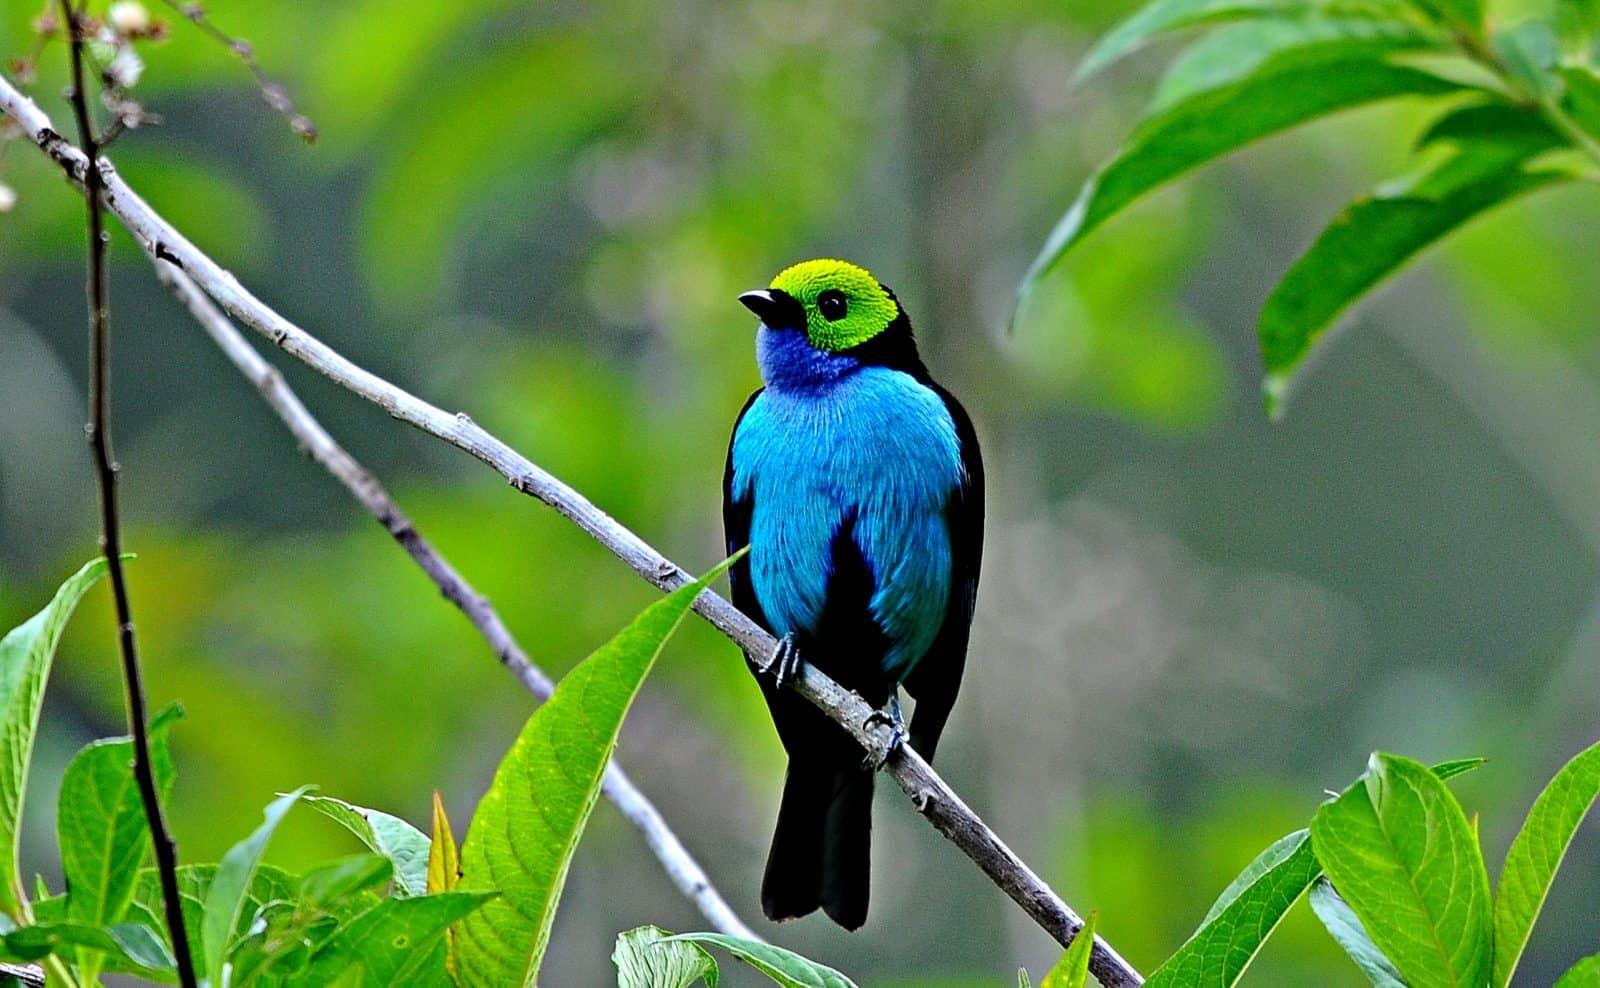 Flora im Amazonas-Regenwald